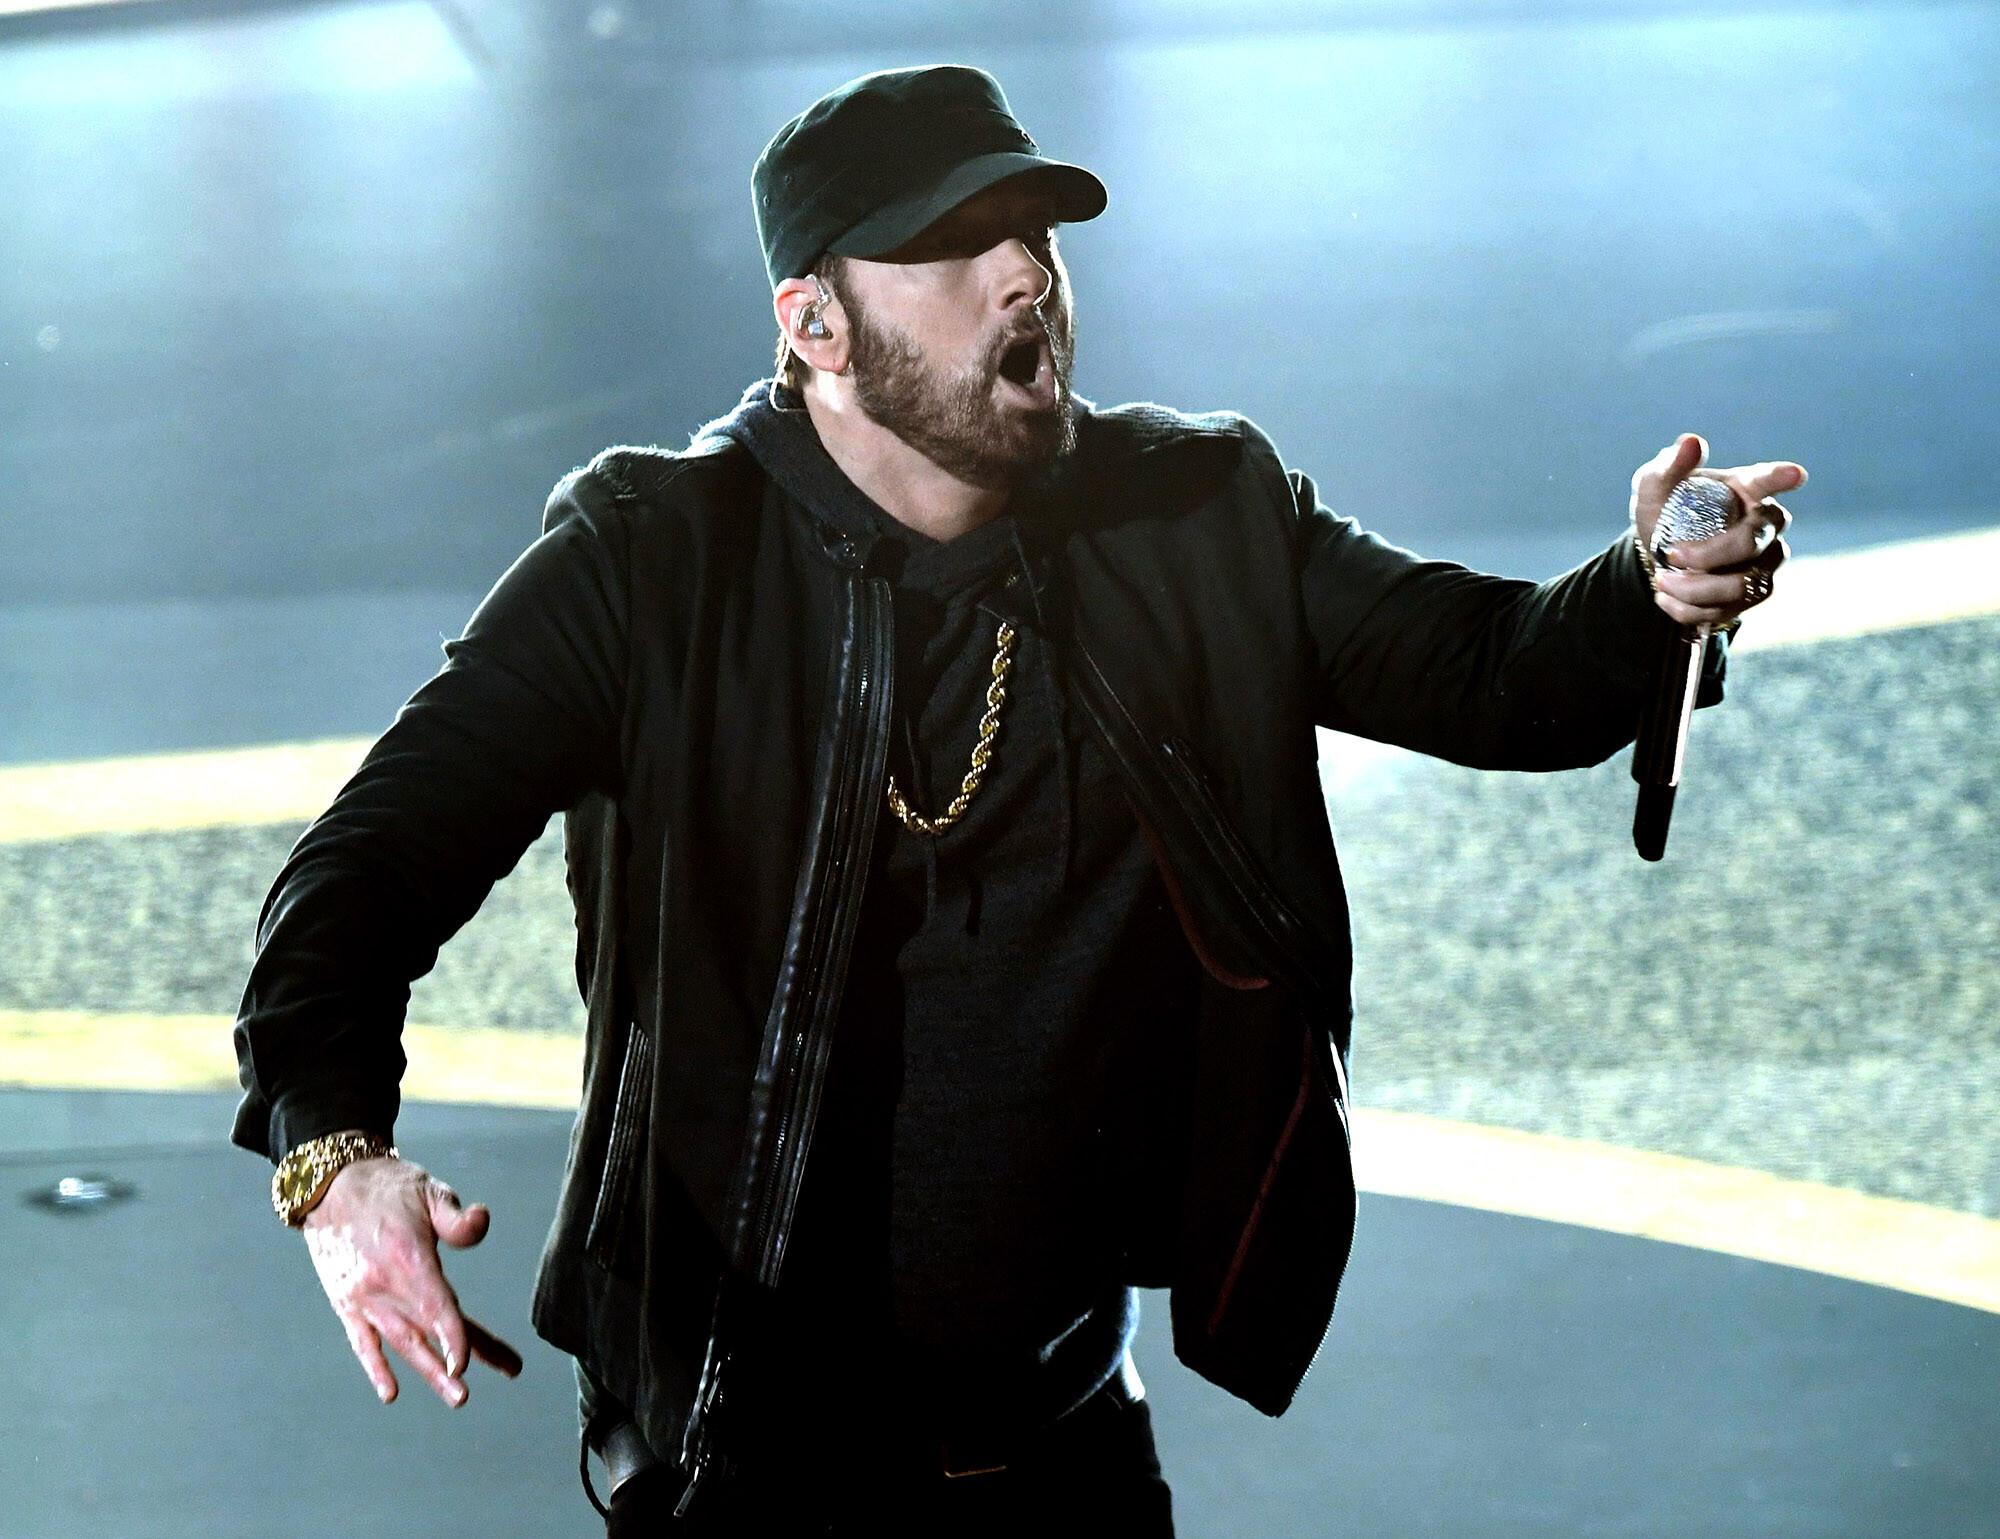 Eminem stars as 'White Boy Rick' in 50 Cent's 'BMF' drama